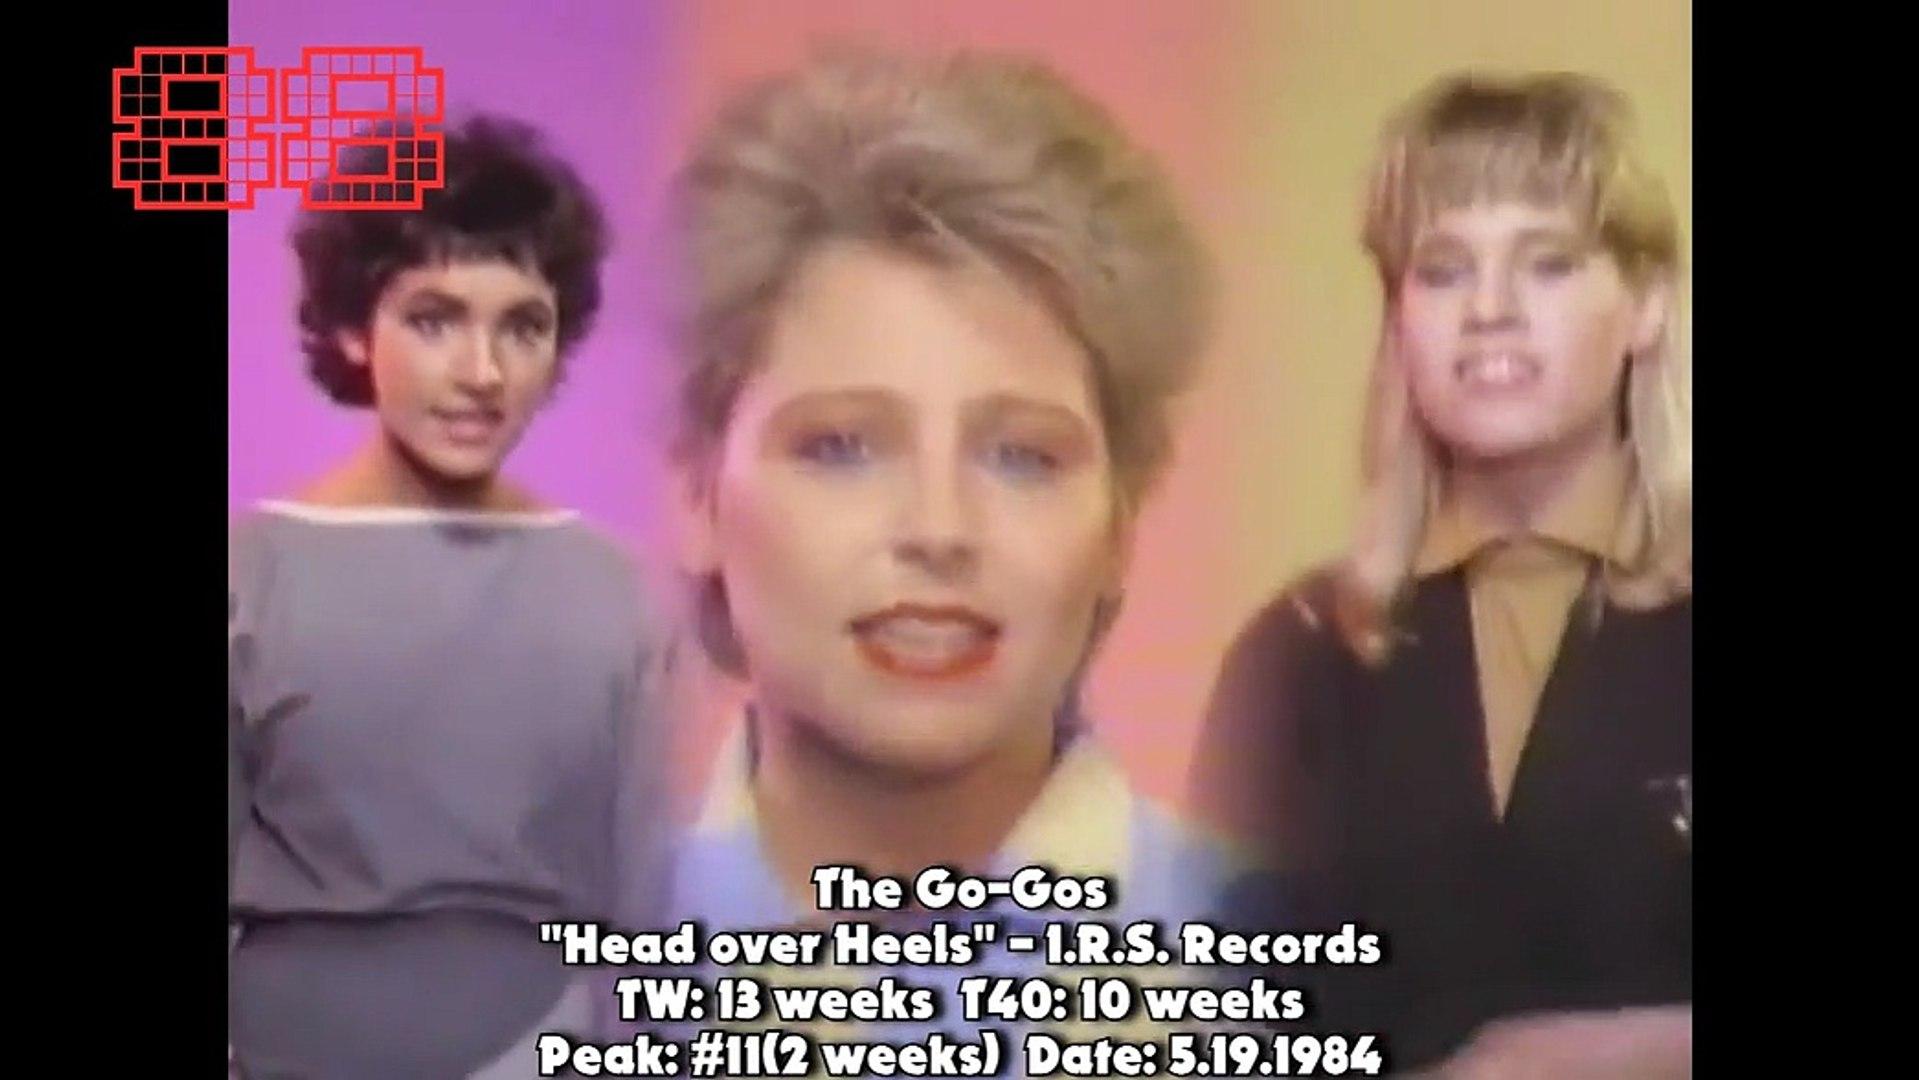 Billboard Year-End Hot 100 Singles of 1984